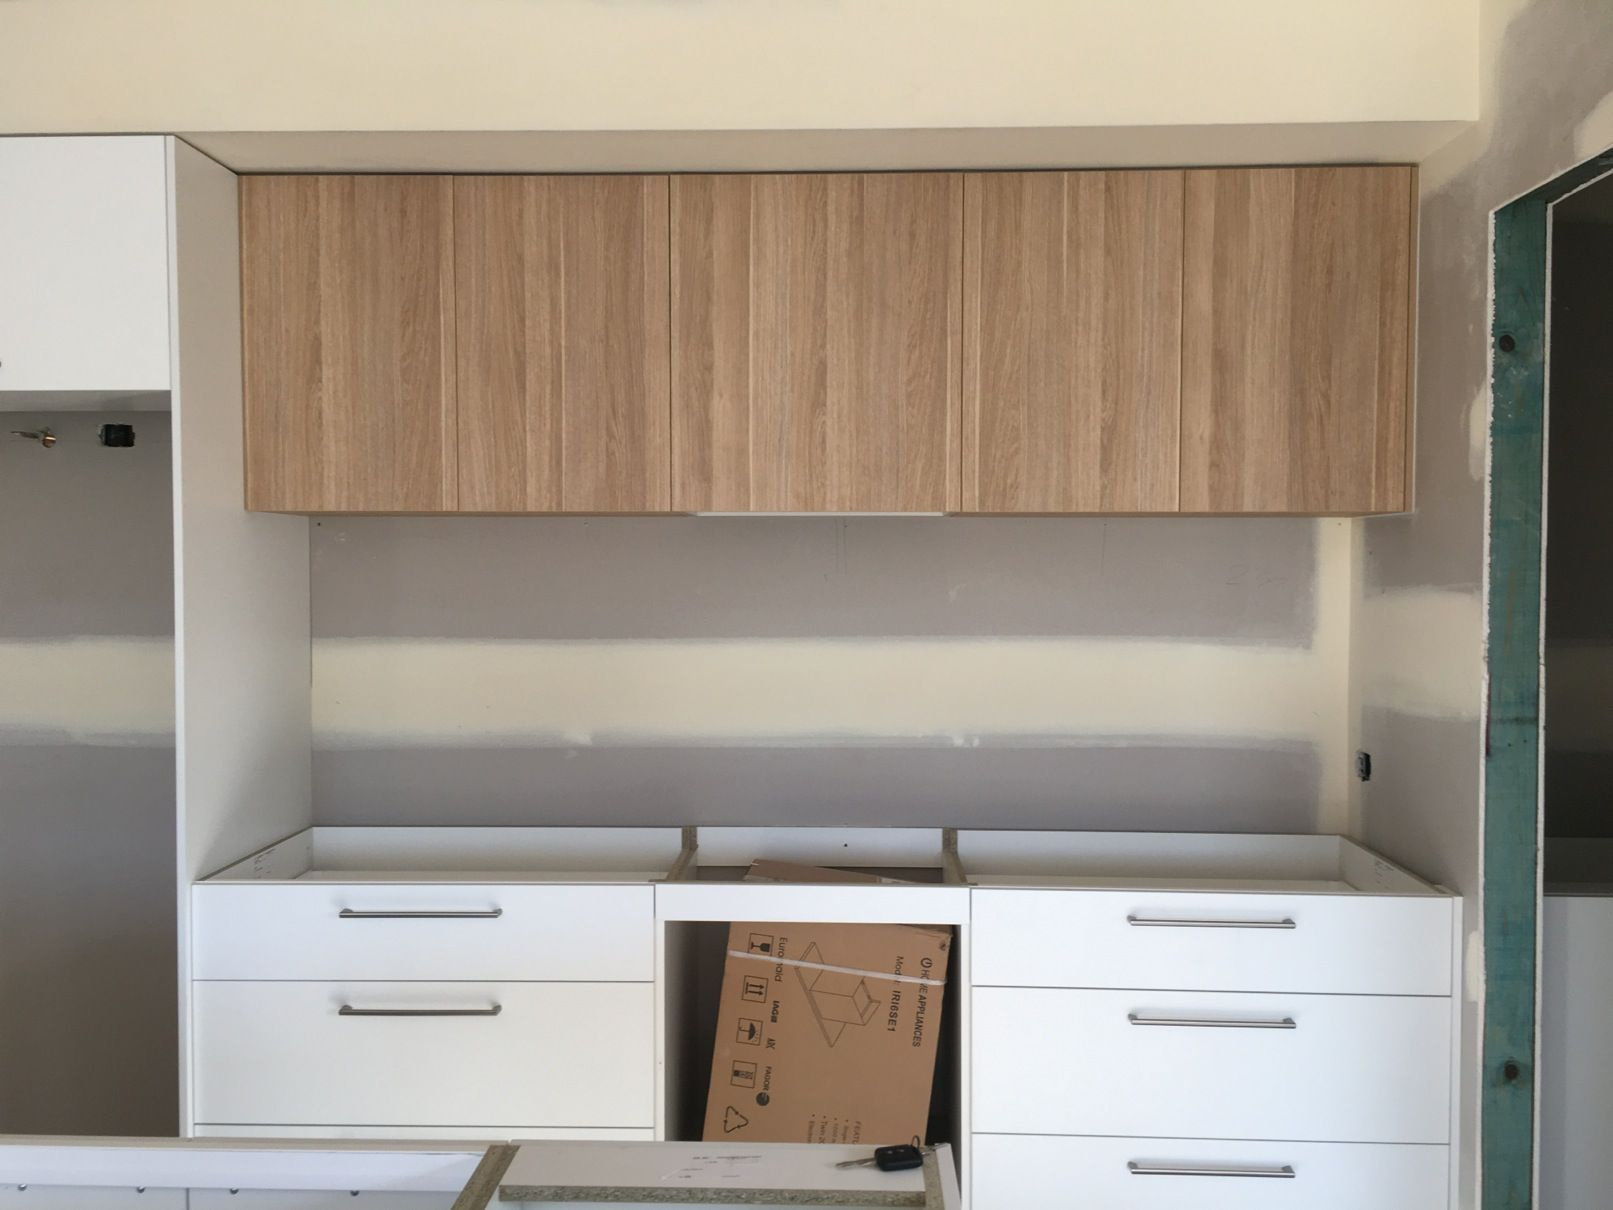 Modern Kitchen With Laminex Polar White Cabinets Polytec Natural Oak Revine Above Counter Cabinets Laminate Kitchen Cabinets Timber Kitchen Laminate Kitchen